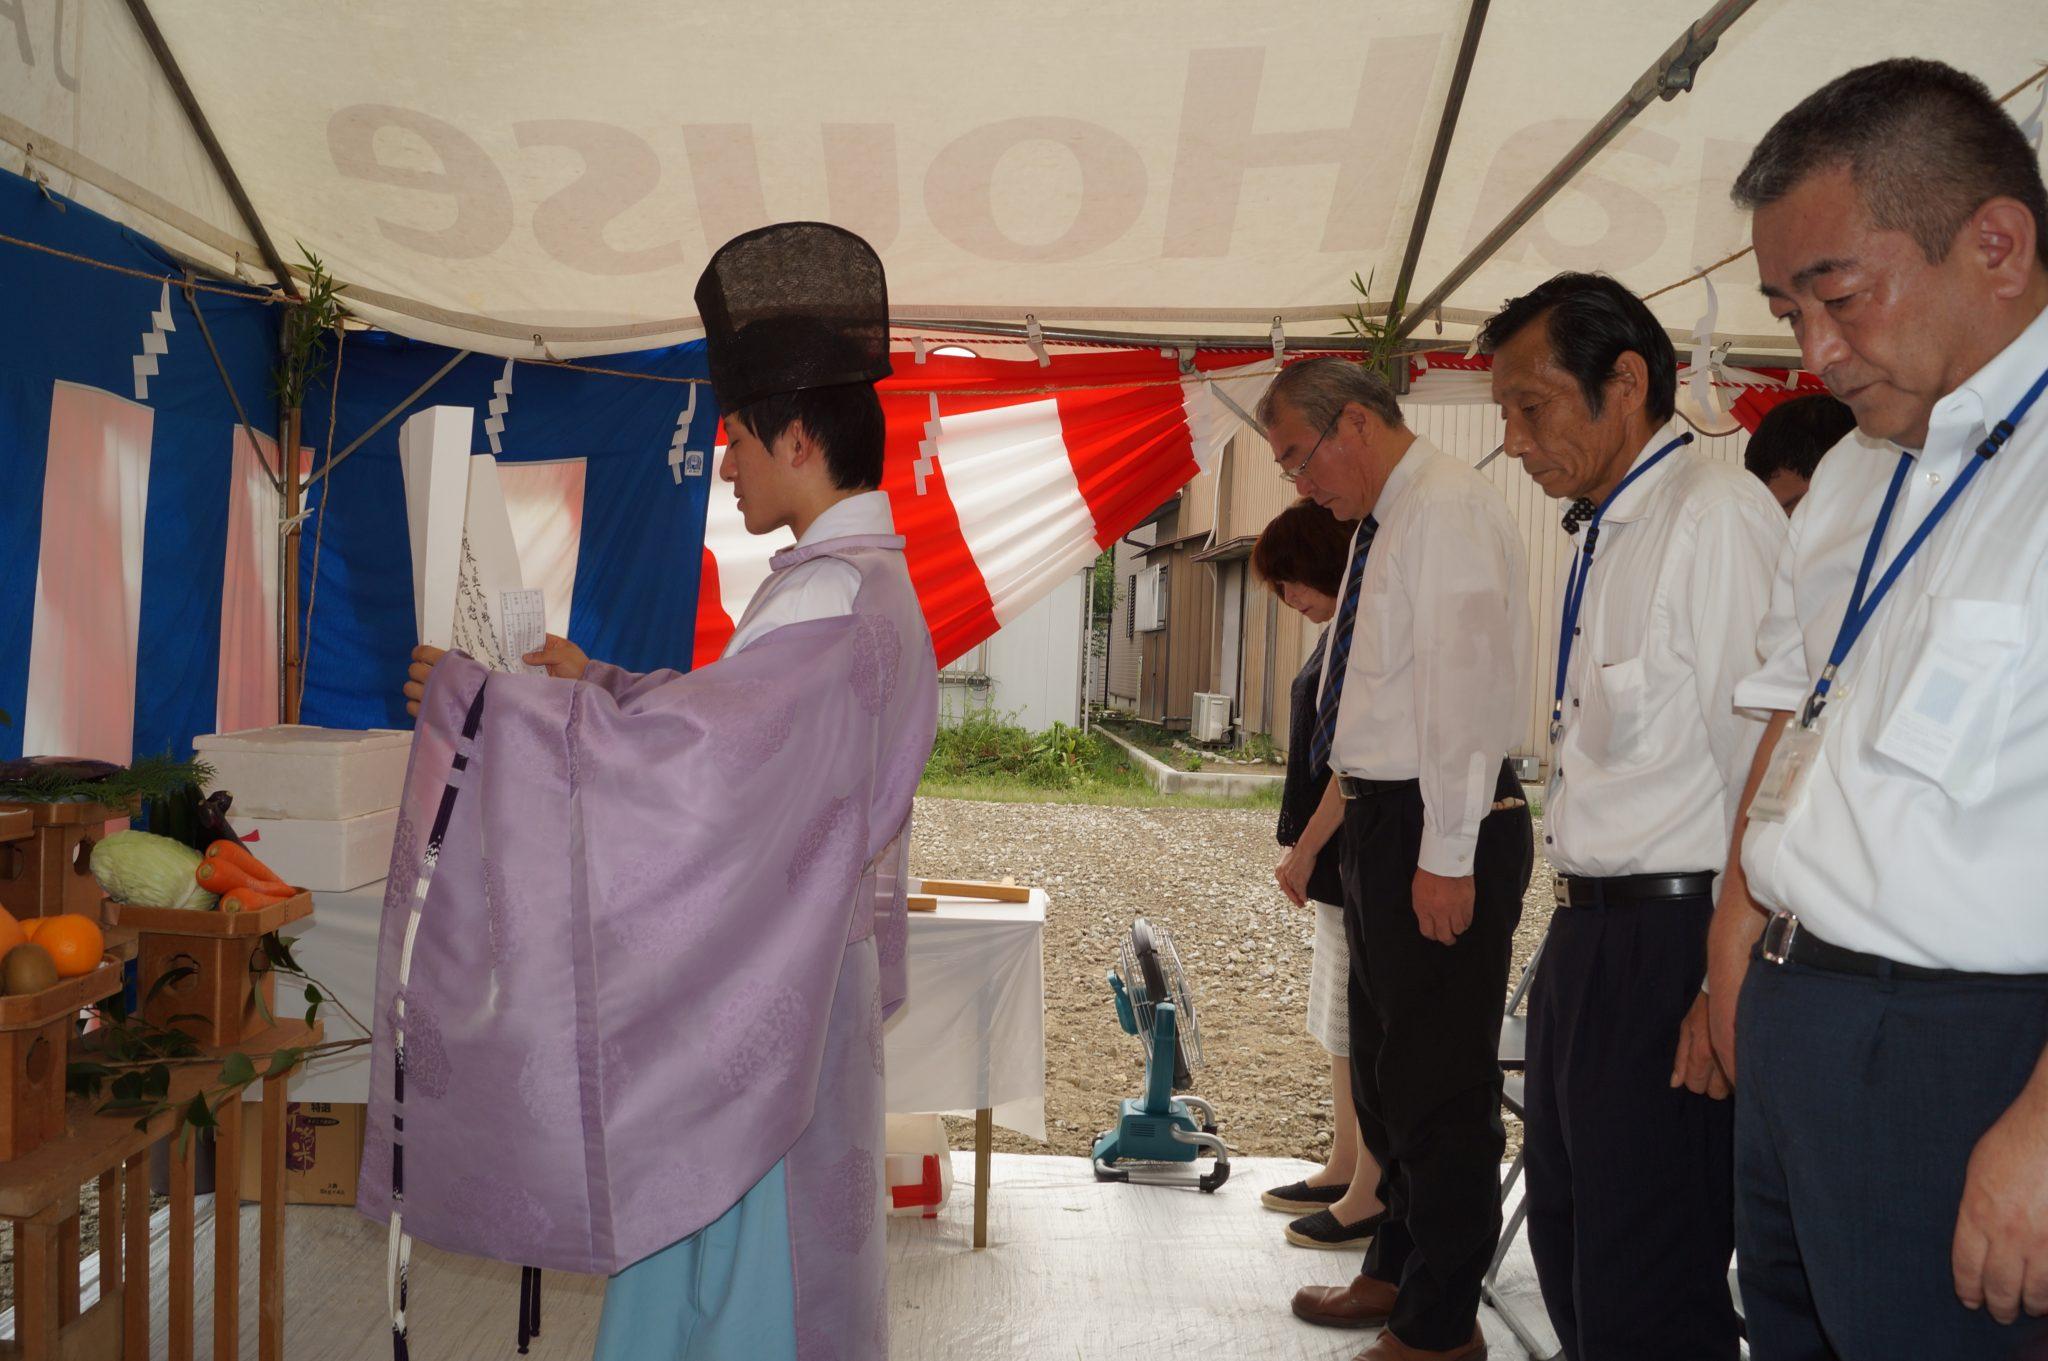 JA 海部東農業協同組合(あまひがし) -資産管理課 土地の有効活用